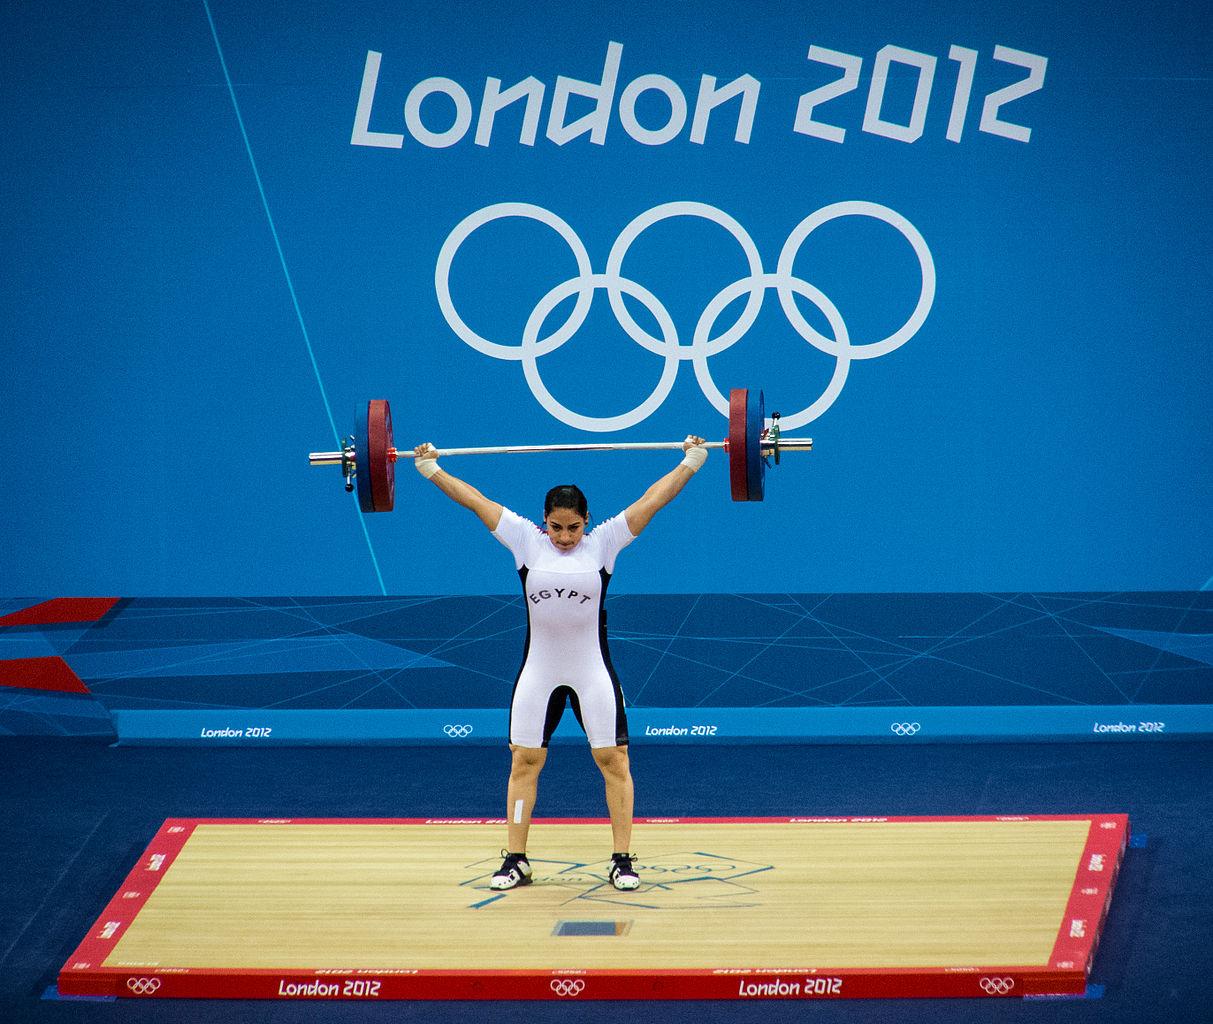 1213px-Abeer_Abdelrahman_Khalil_Mahmoud_Olympics_2012_Women's_75kg_Weightlifting